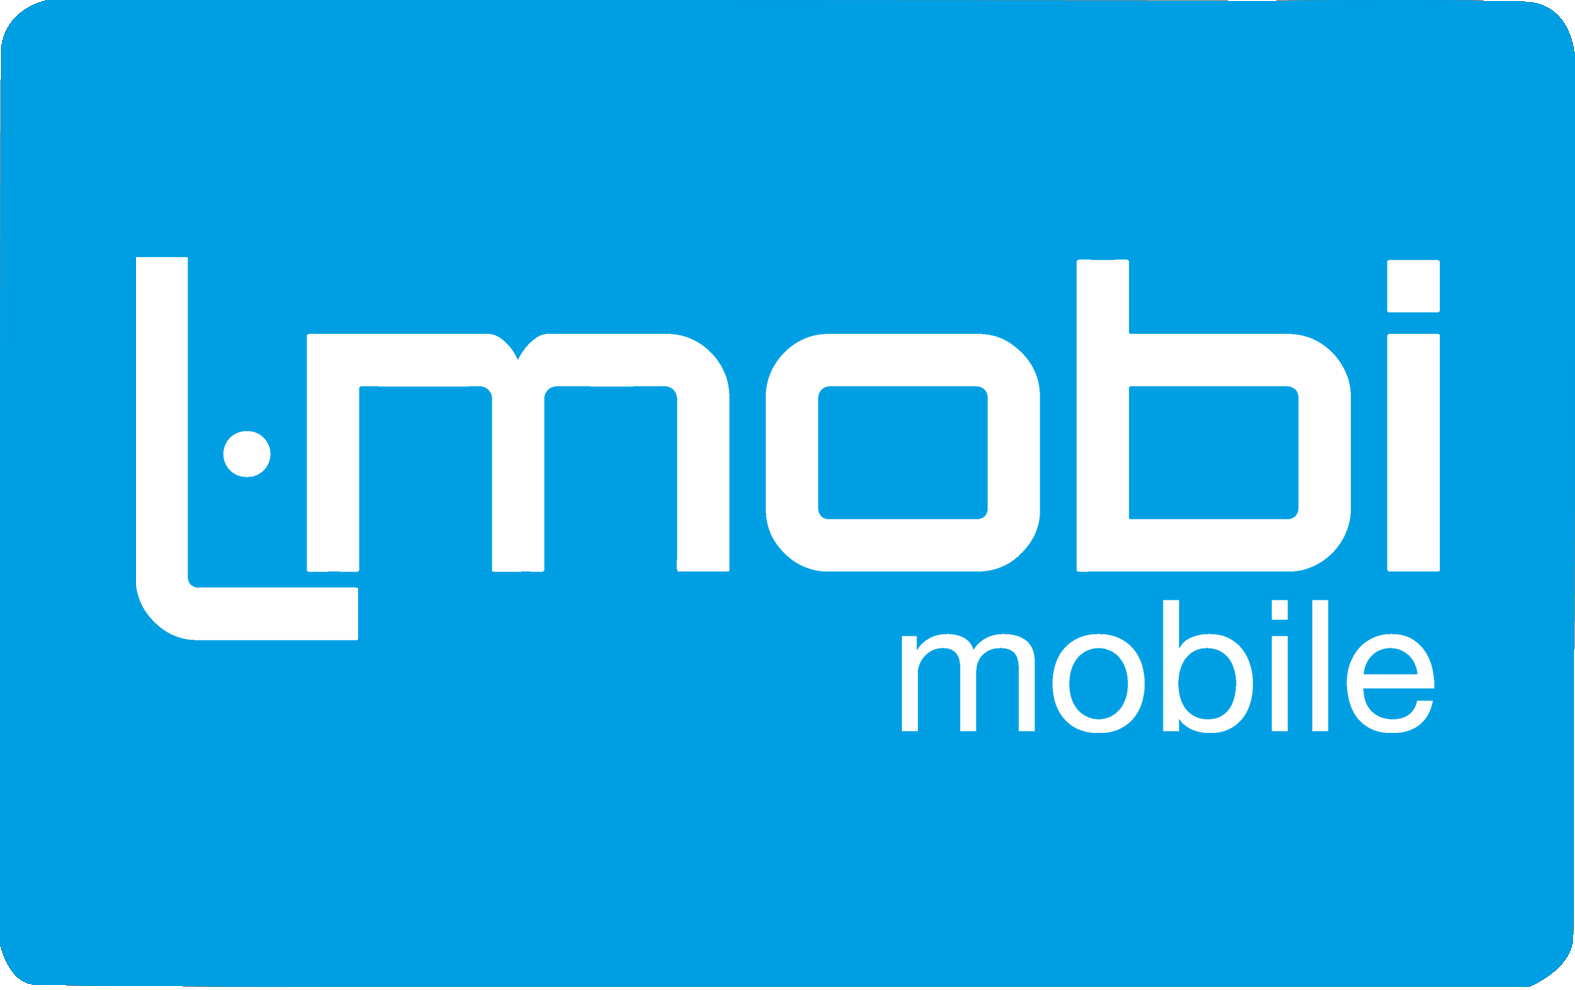 L-mobi